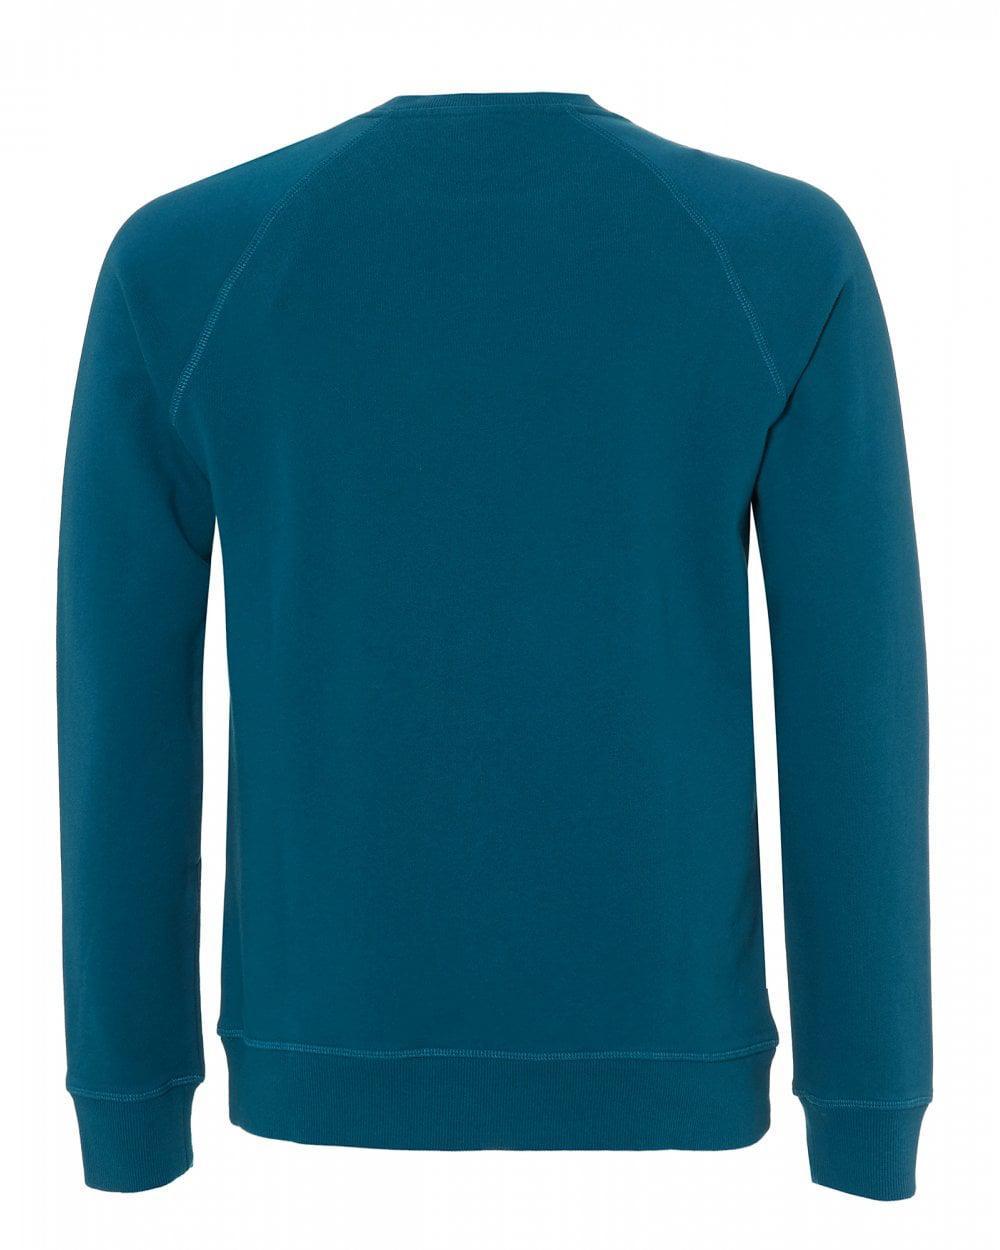 e787292e BOSS Wyan Sweatshirt, French Terry Teal Blue Sweat in Blue for Men - Lyst